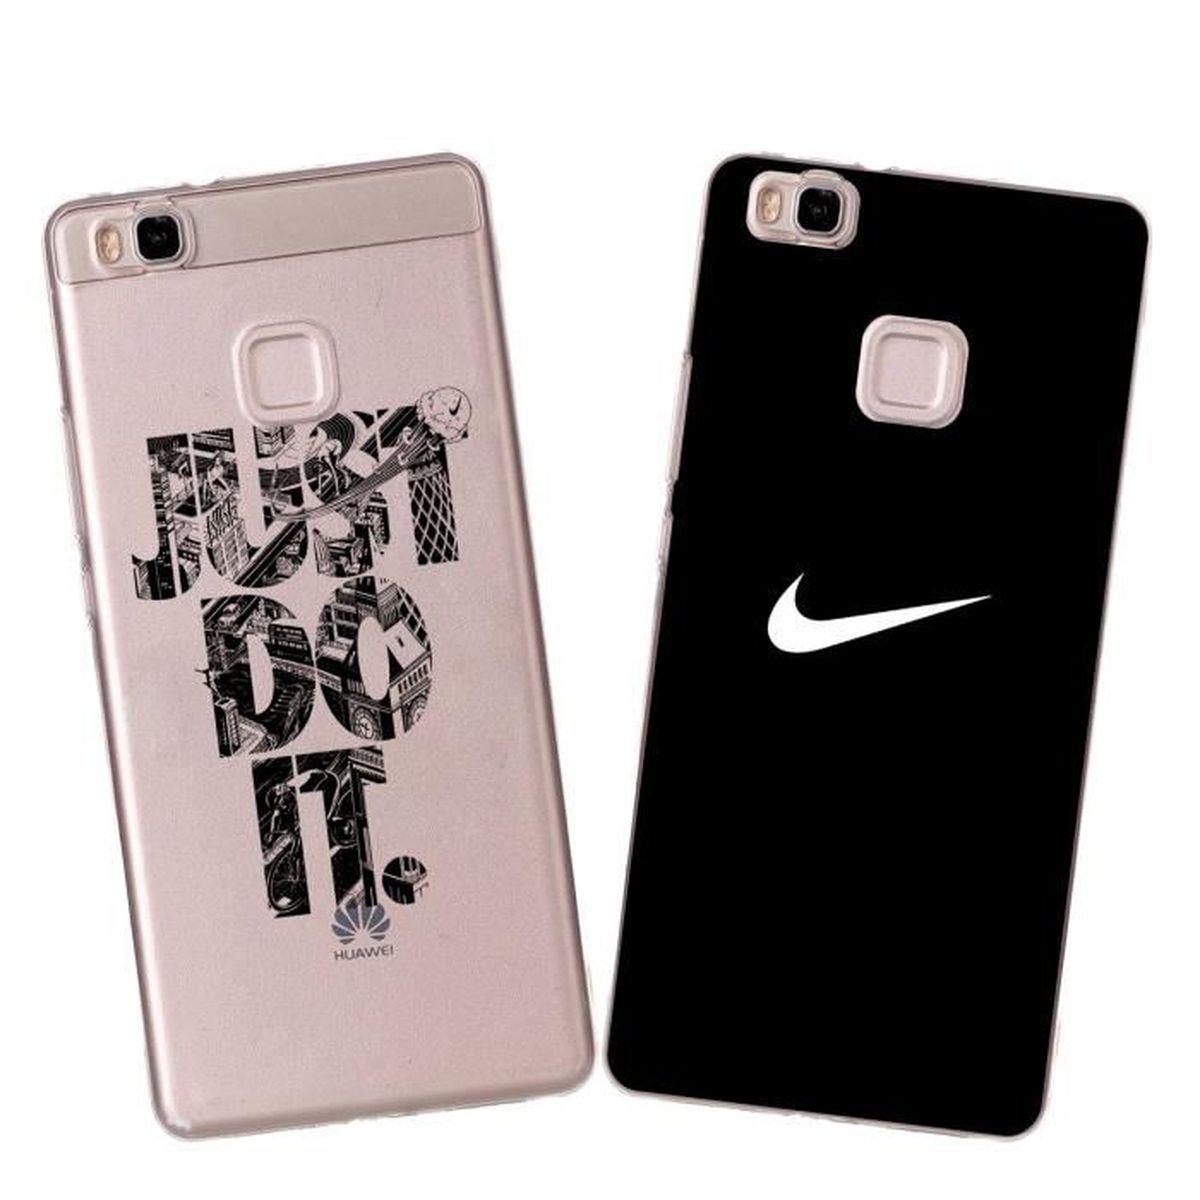 2 X Coque Huawei P9 Lite, Nike Doux Souple TPU Silicone Housse ...